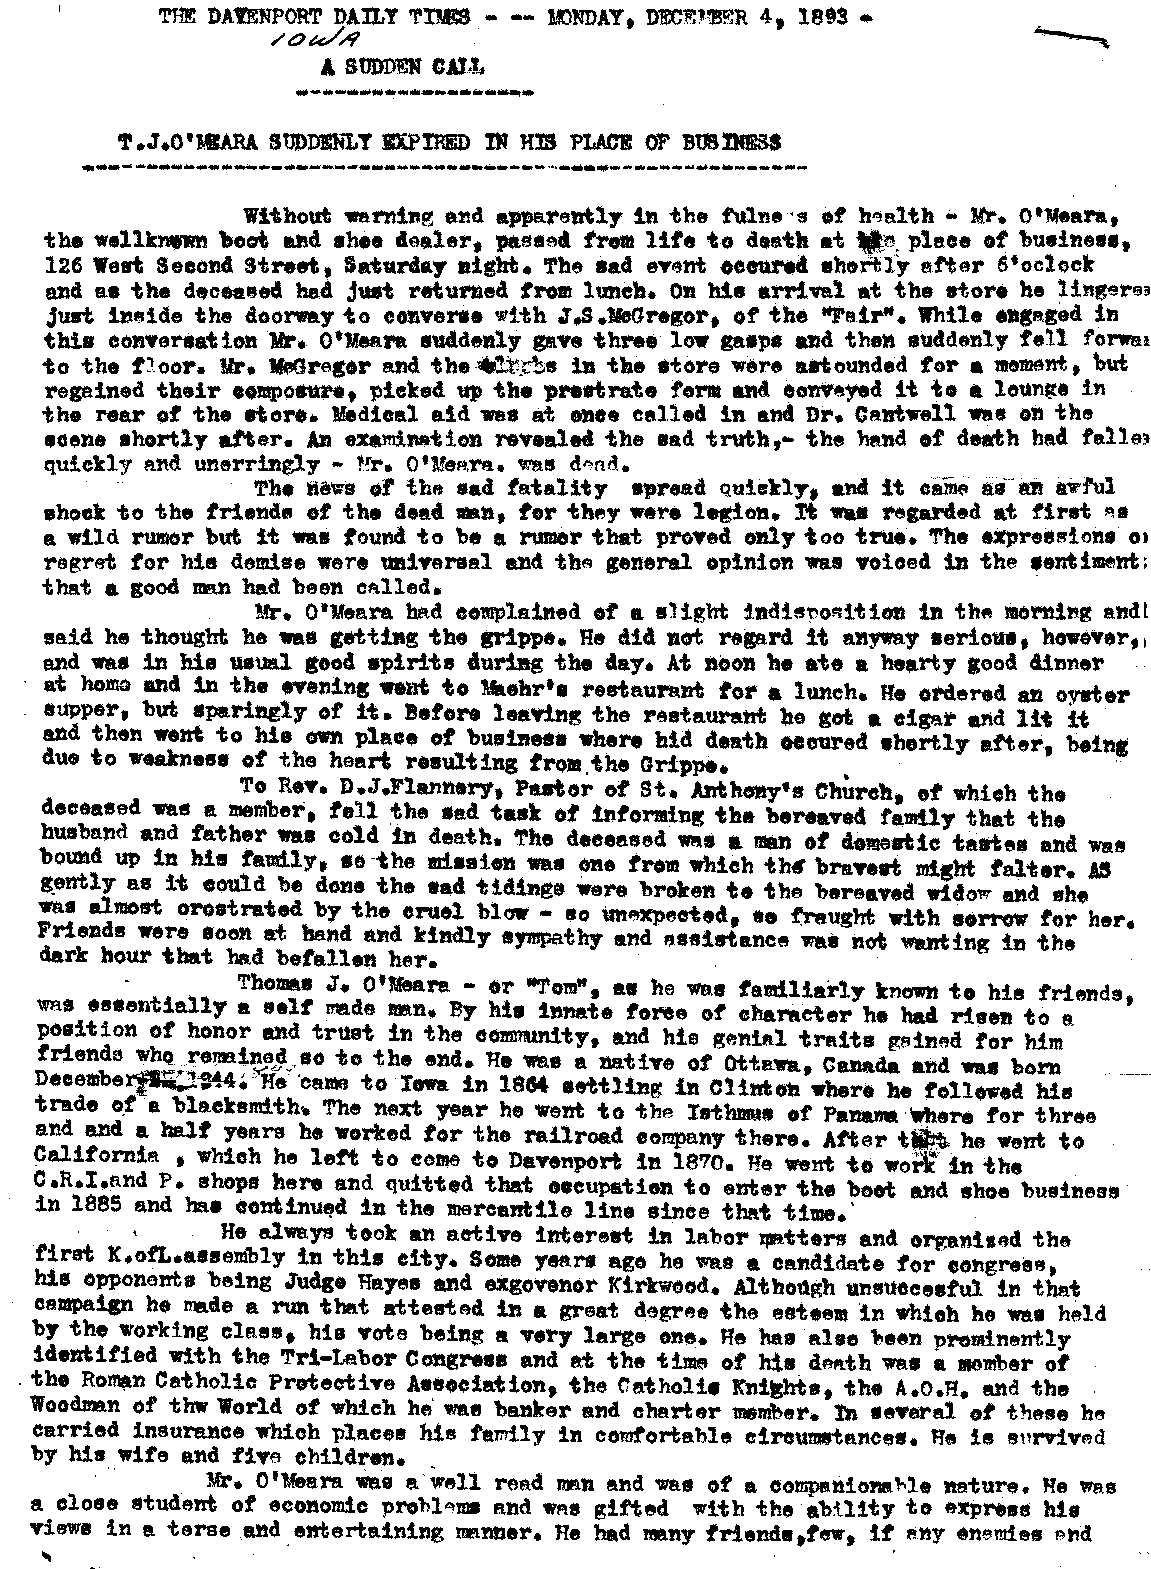 Thomas O'Meara Obit page 1